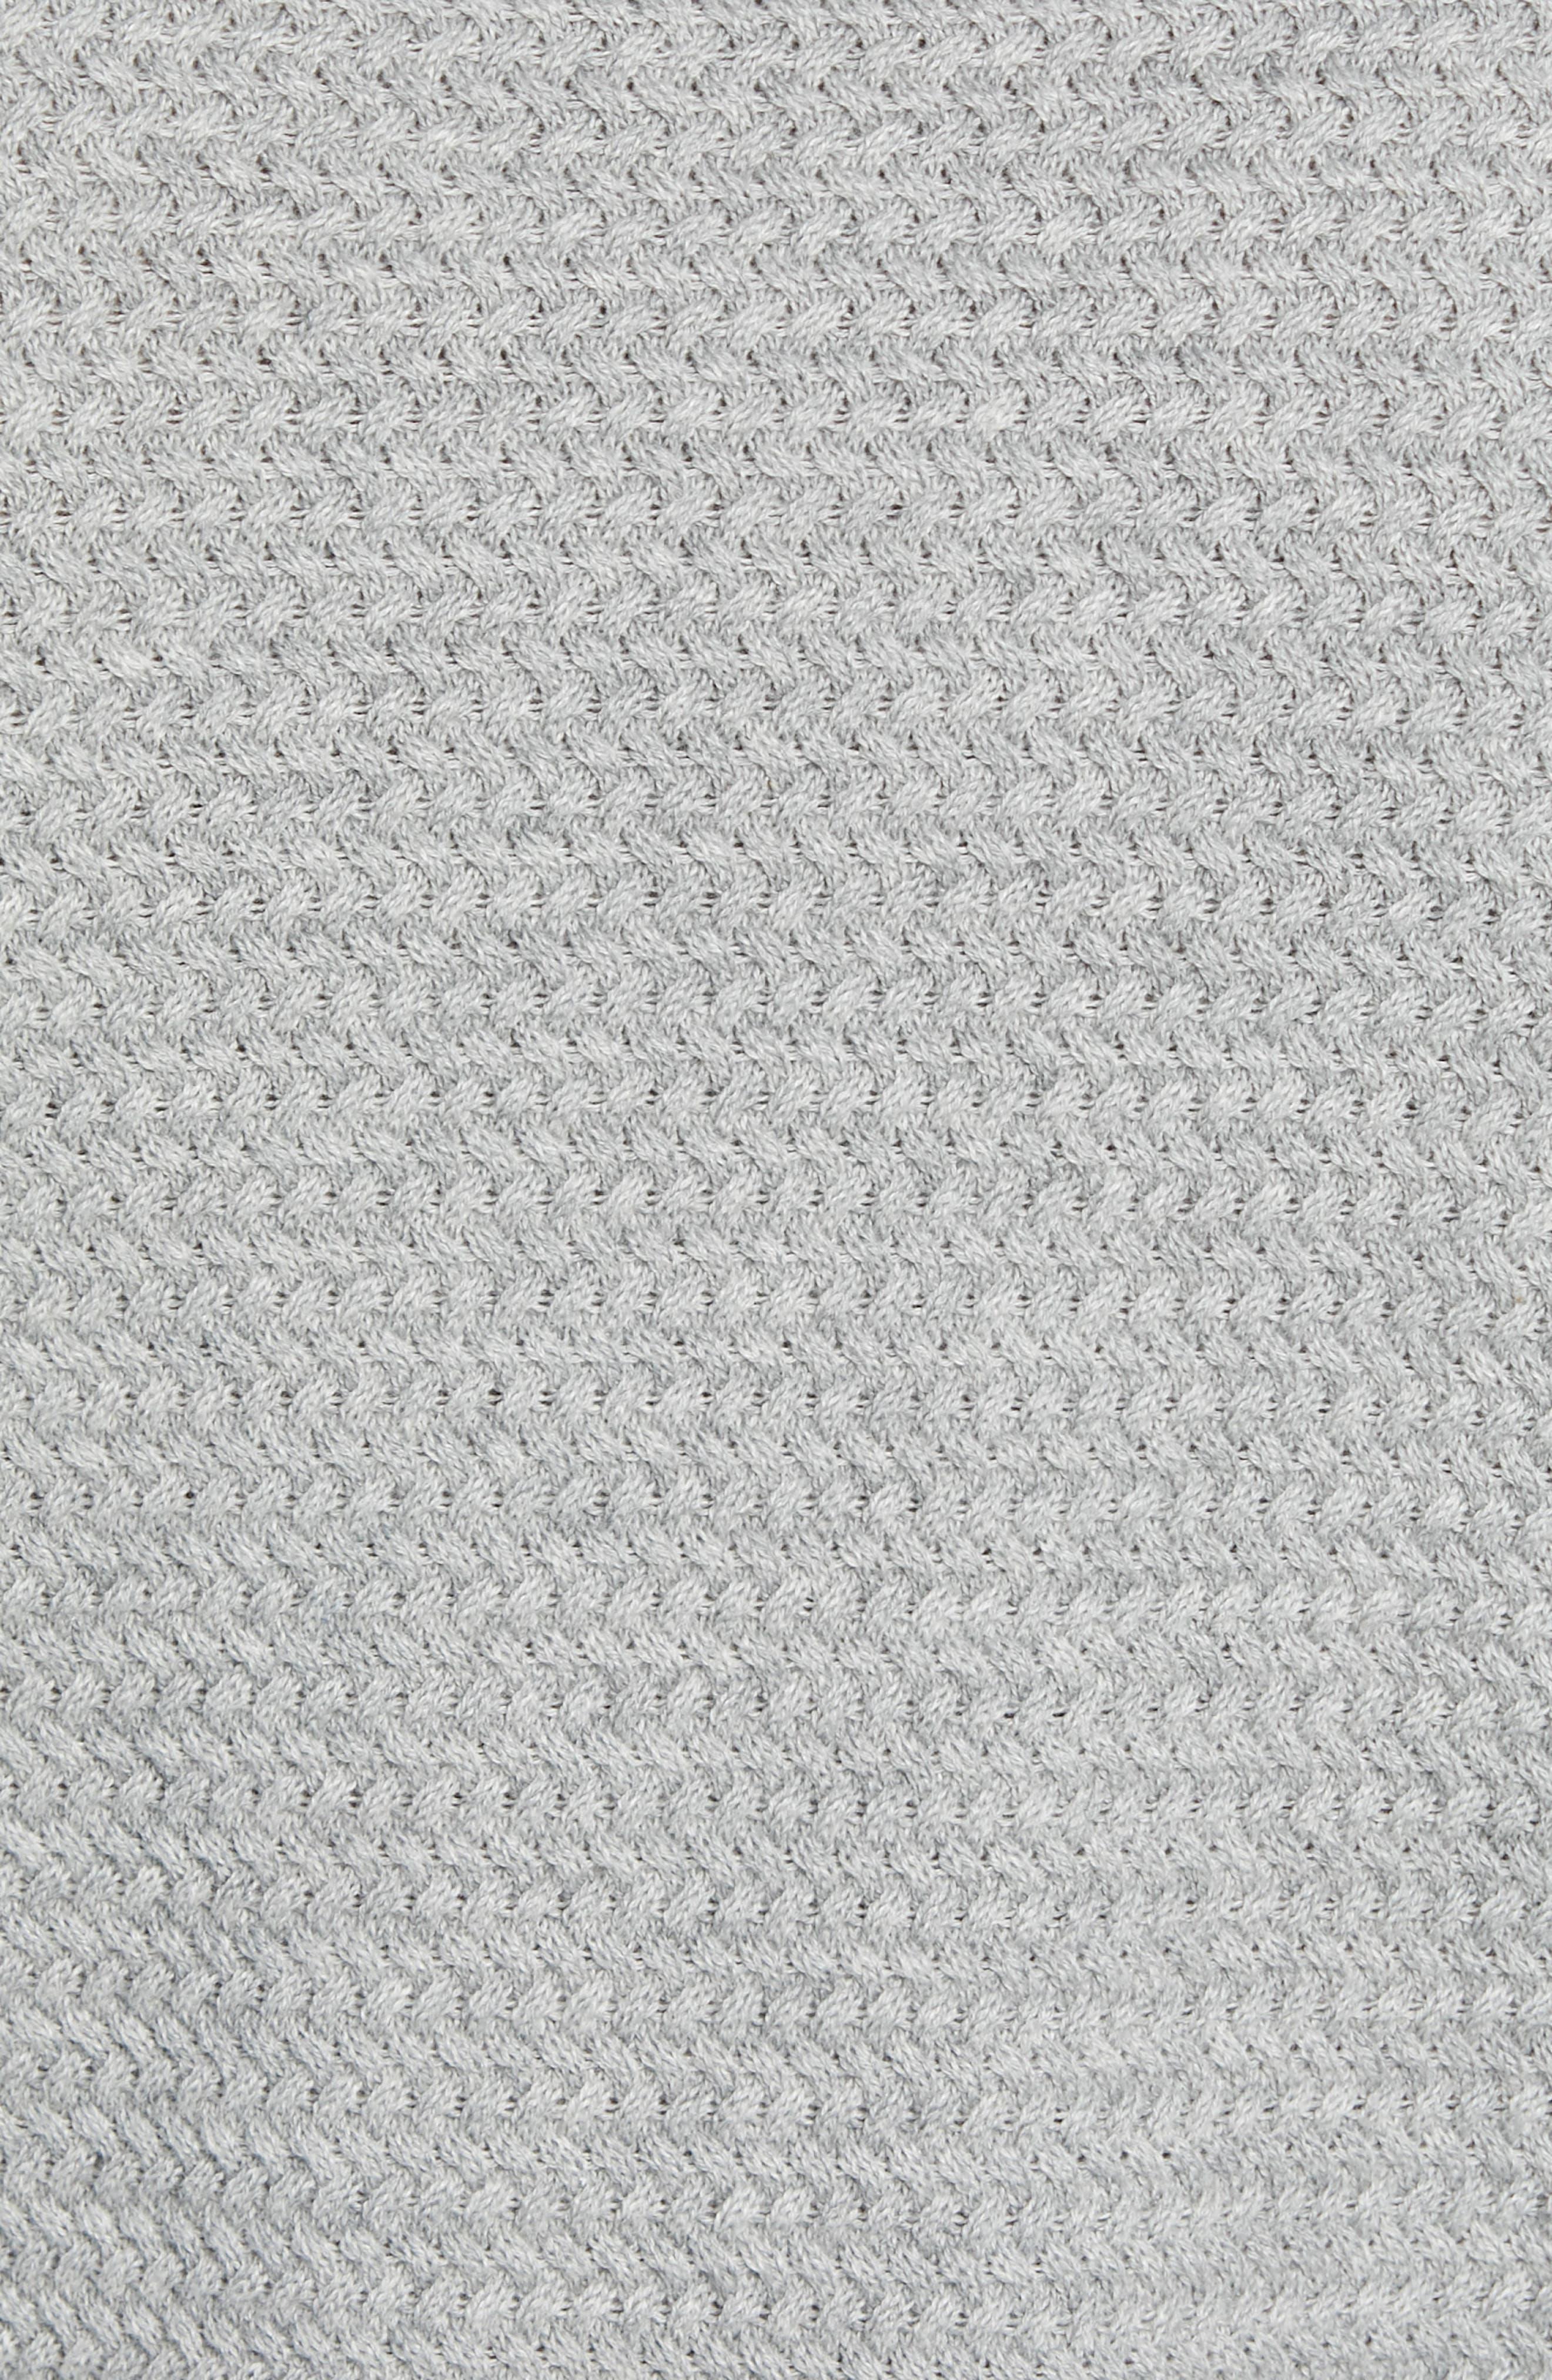 Martin Regular Fit Crewneck Sweater,                             Alternate thumbnail 5, color,                             MEDIUM GREY